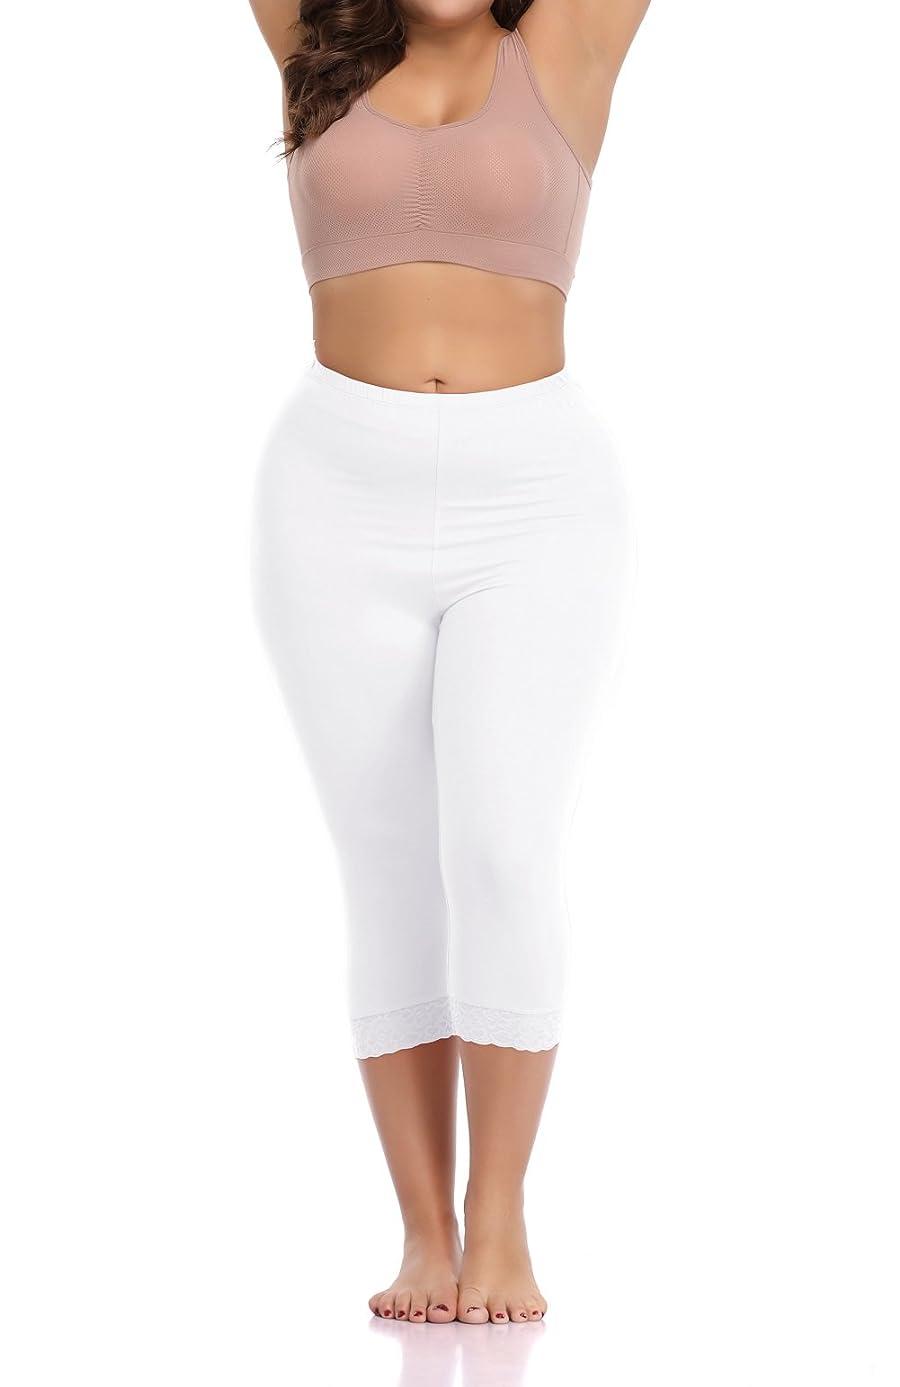 MINIVOG Women's Leggings Plus Size Stretchy Ultra Soft 3/4 Length Solid Capri with Lace Trim